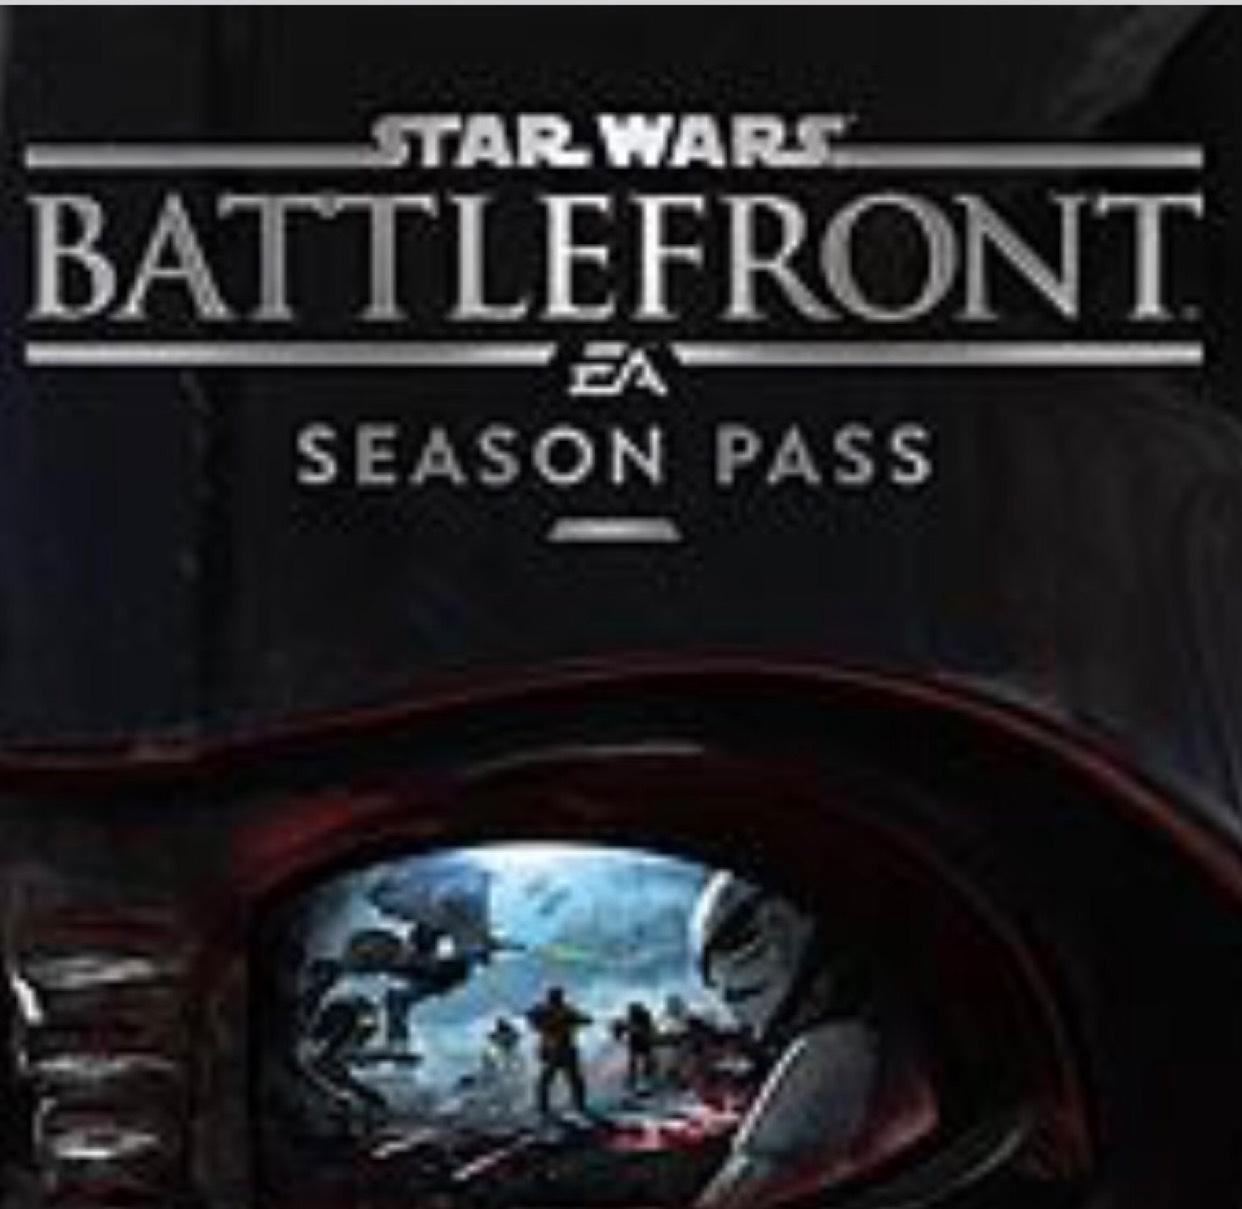 Star Wars Battlefront Season Pass Free, Ultimate Edition £3.99 @ PSN Store